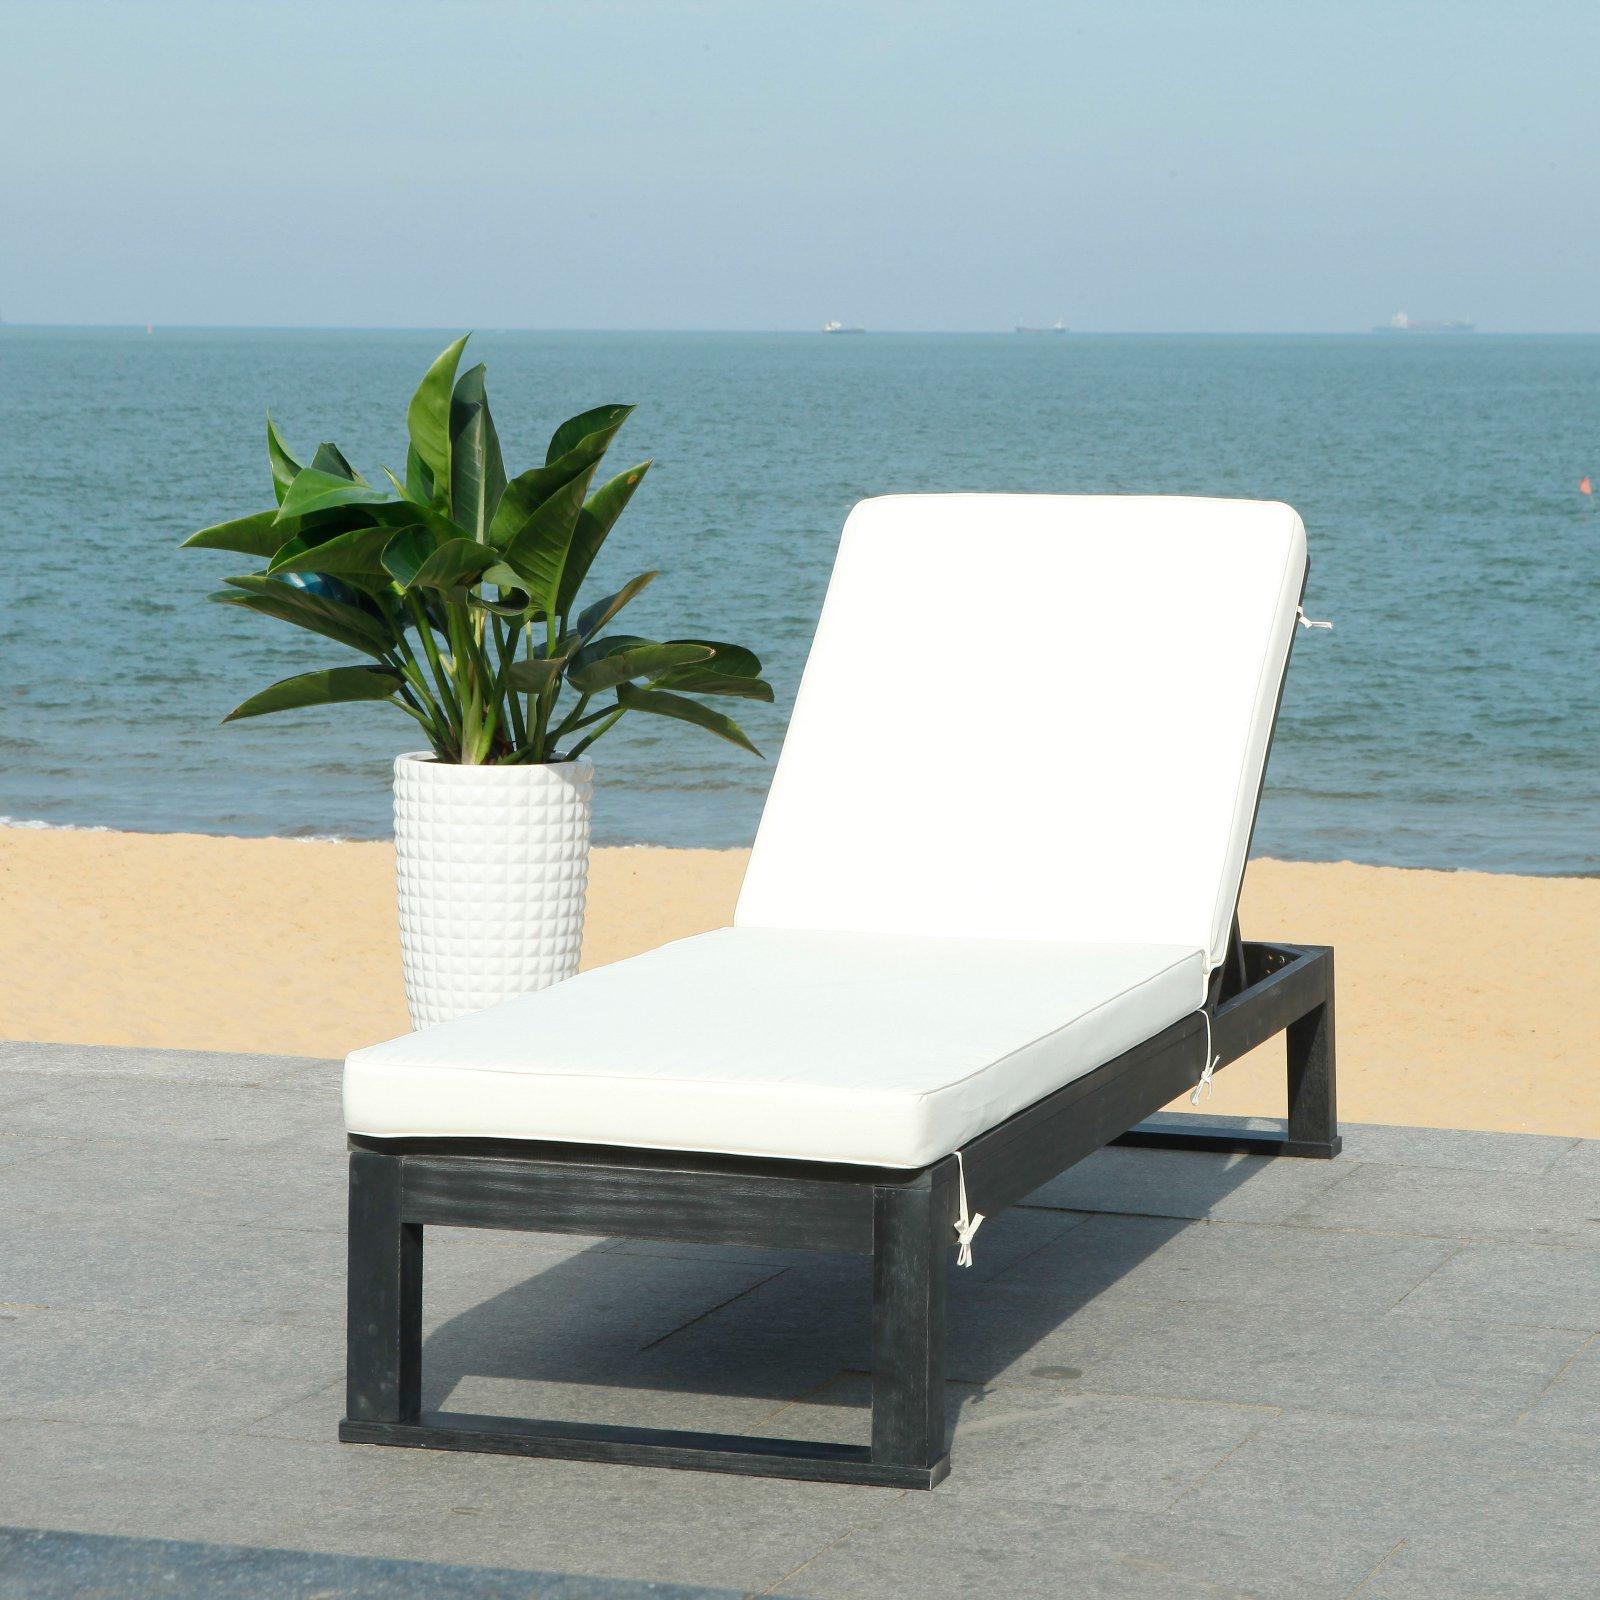 Safavieh Solano Outdoor Contemporary Patio Sunlounger with Cushion